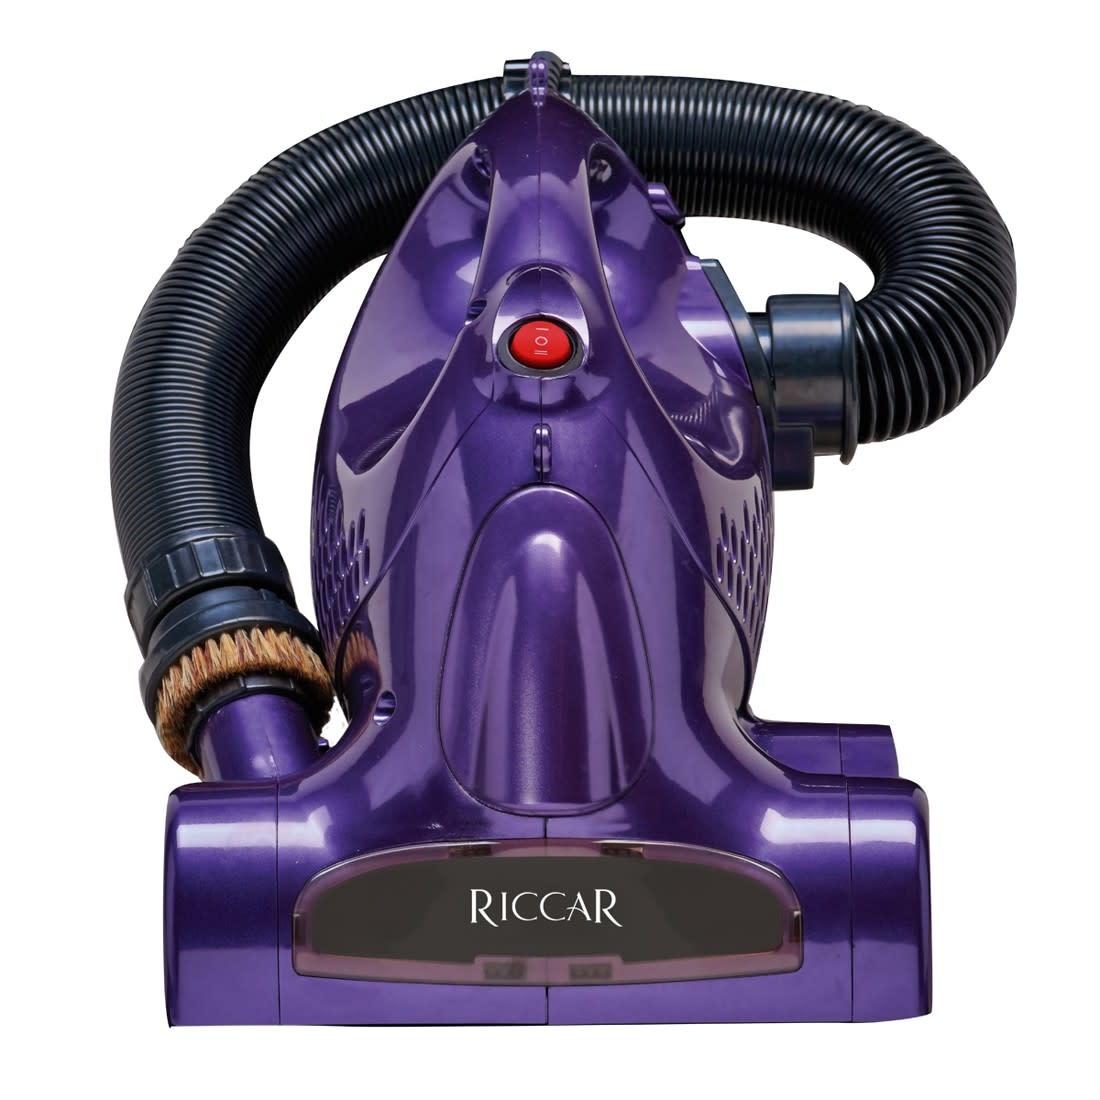 Riccar **NLA** Riccar Squire Handheld Vacuum with Power Brush